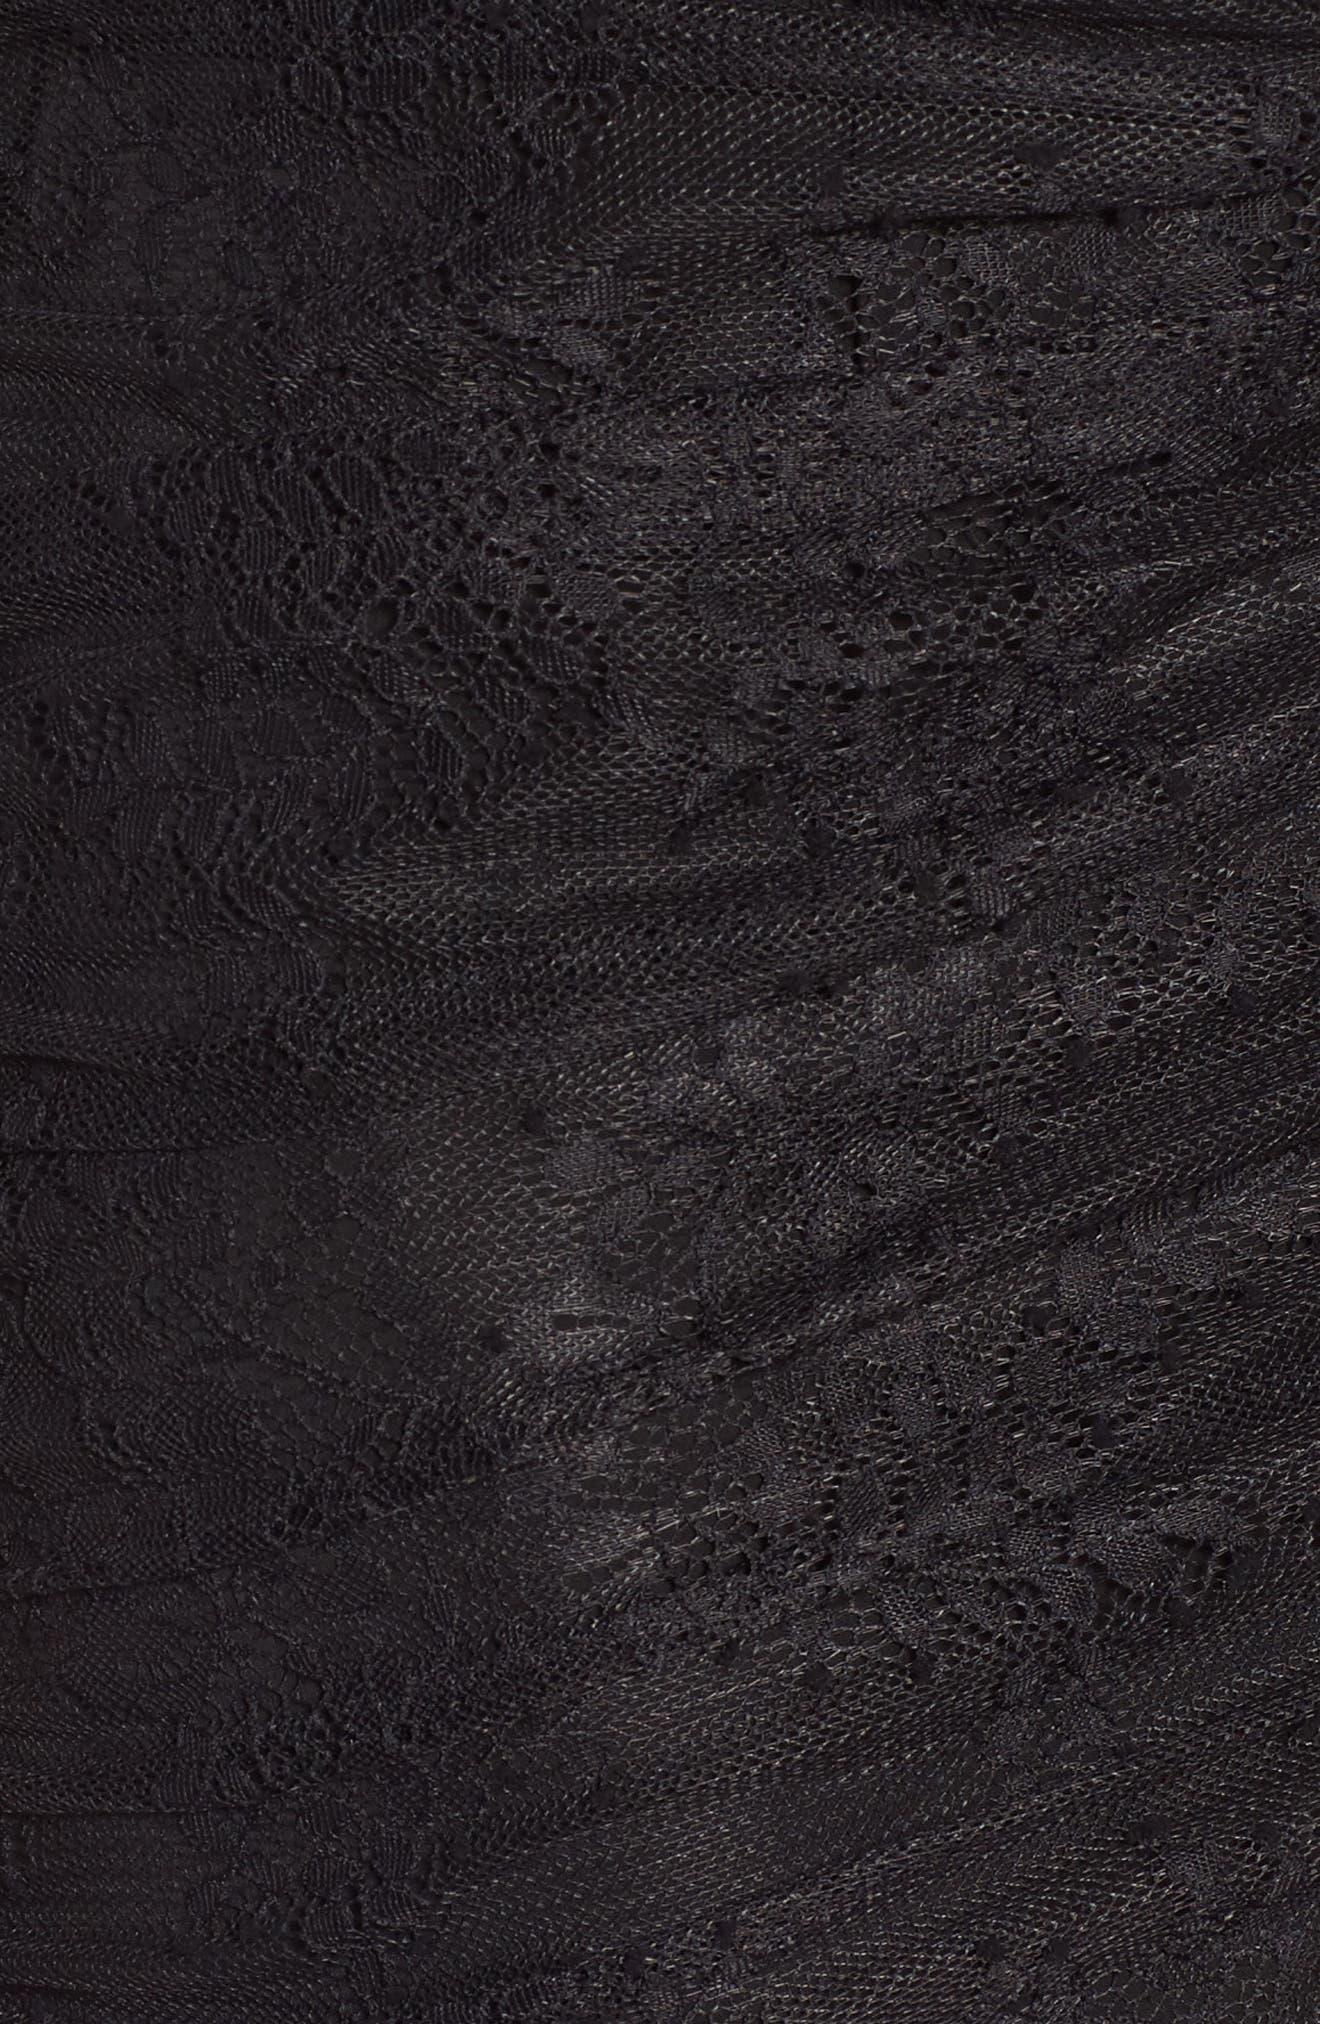 Daisy Lace Minidress,                             Alternate thumbnail 5, color,                             Black